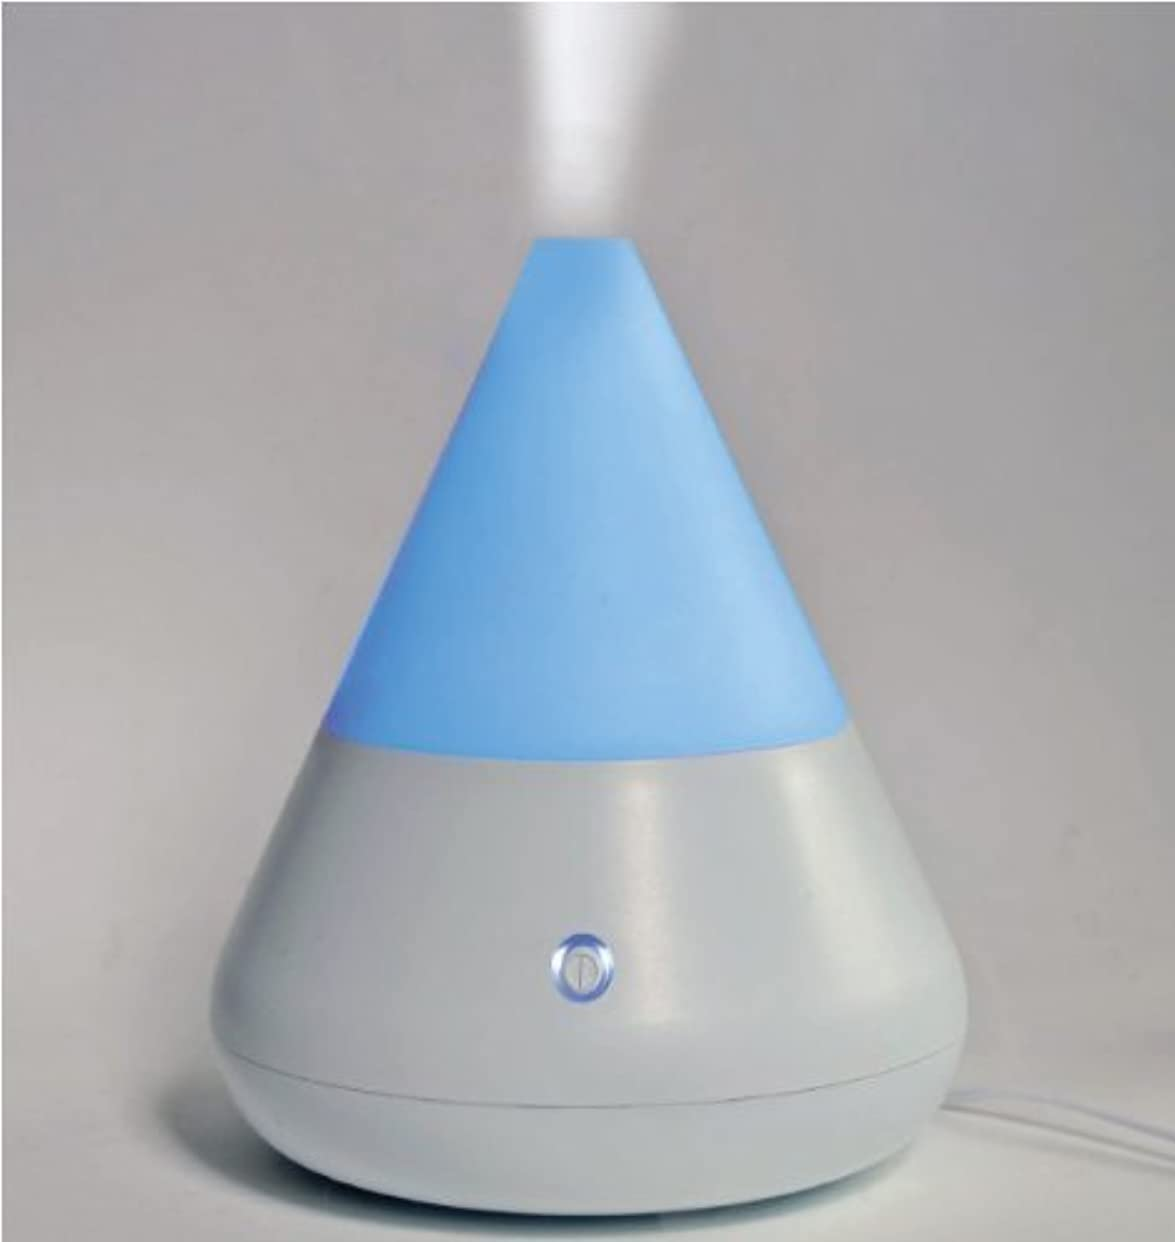 Saachi アロマテラピー 超音波エッセンシャルオイル アロマディフューザー セラピーエアーフレッシュナー